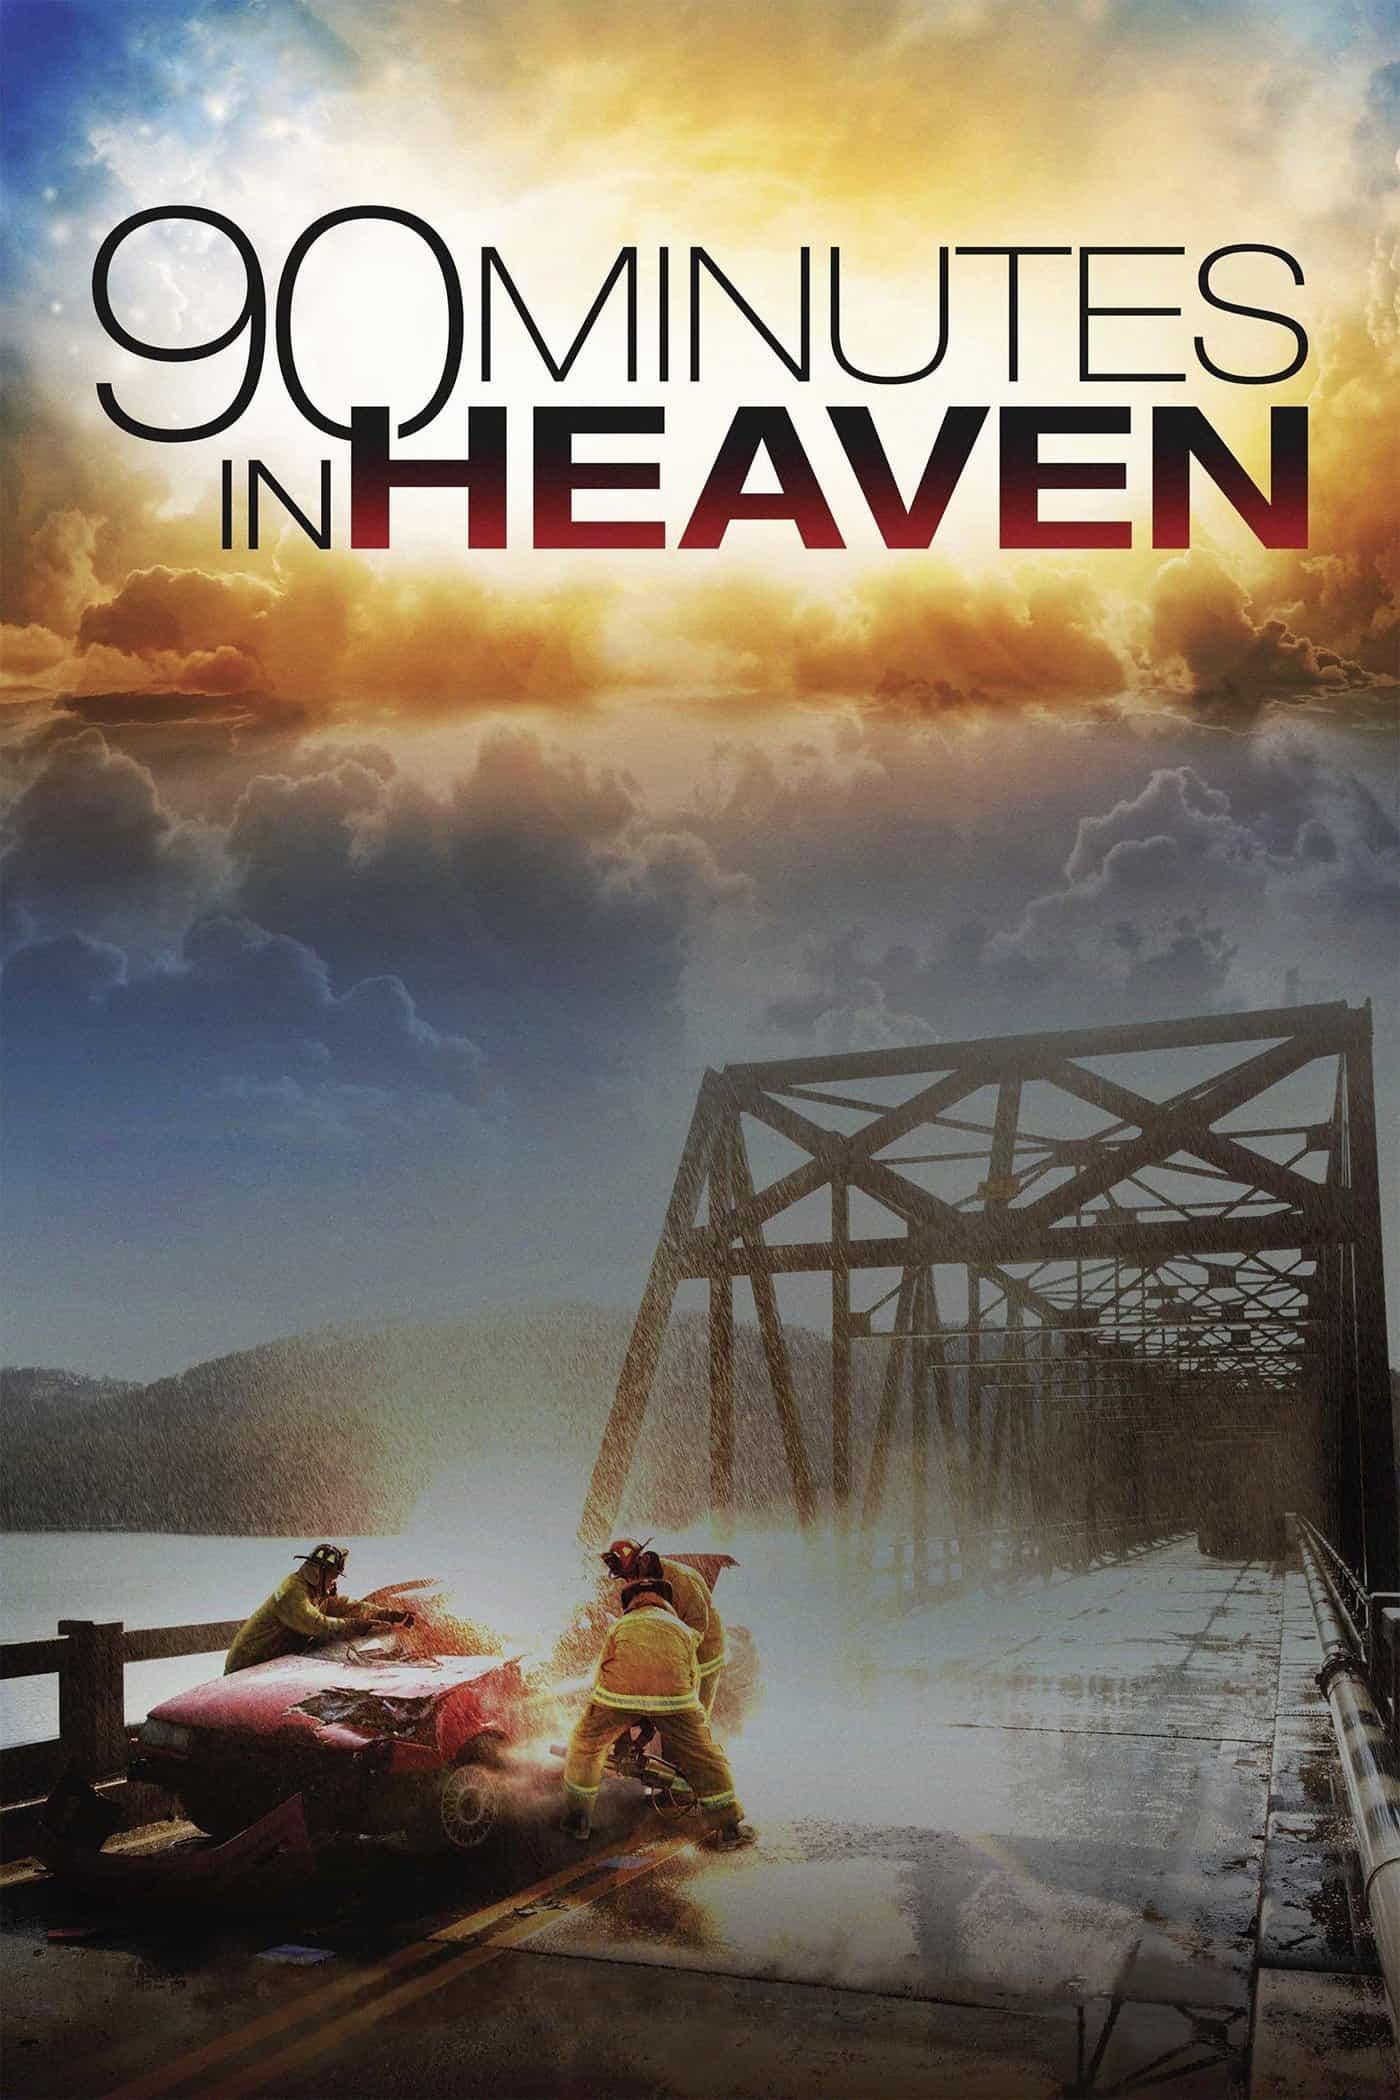 90 Minutes in Heaven, 2015